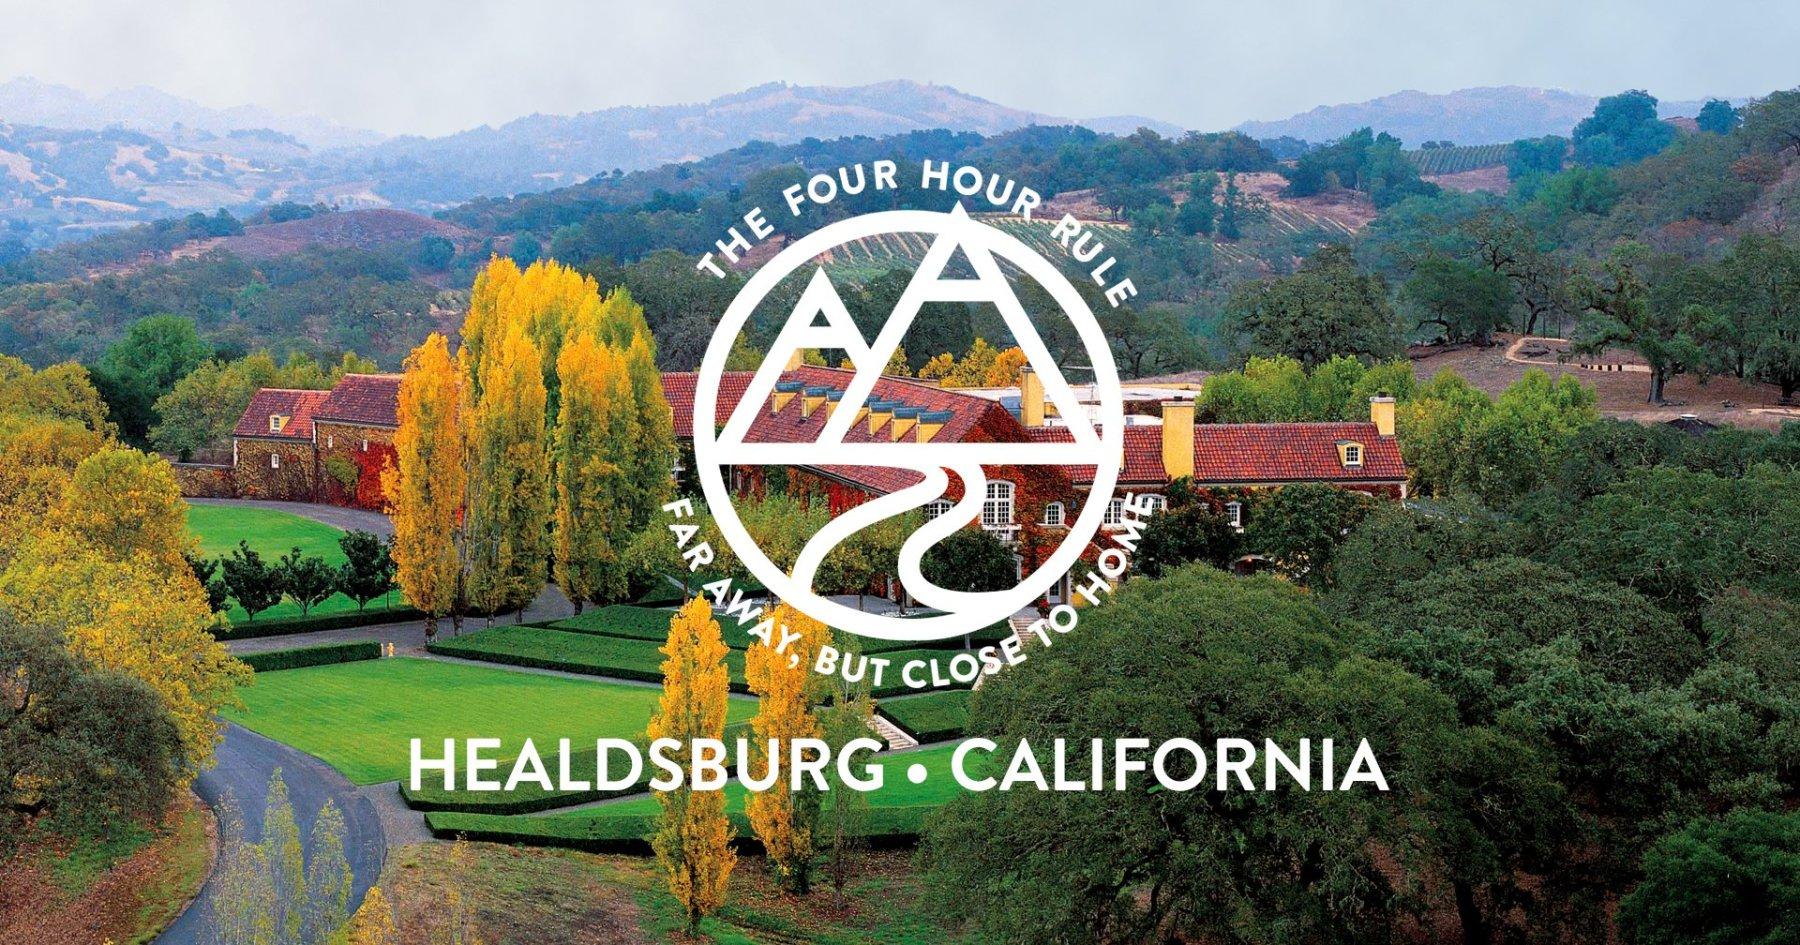 Four-Hour Rule: Healdsburg